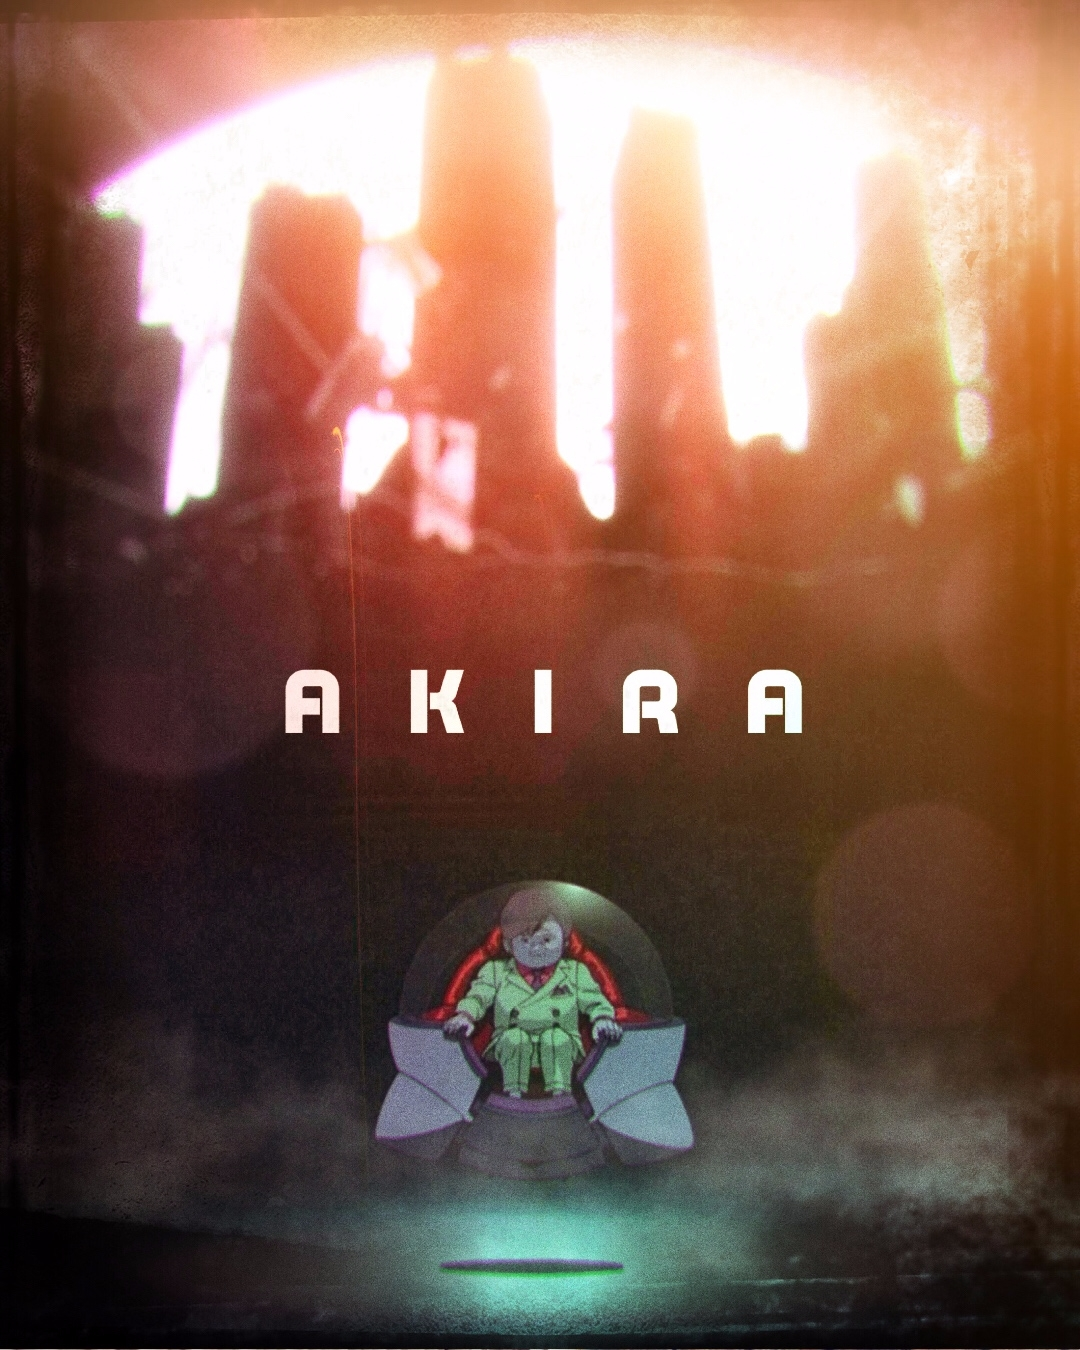 AKIRA poster design variant cin - pinheiro | ello